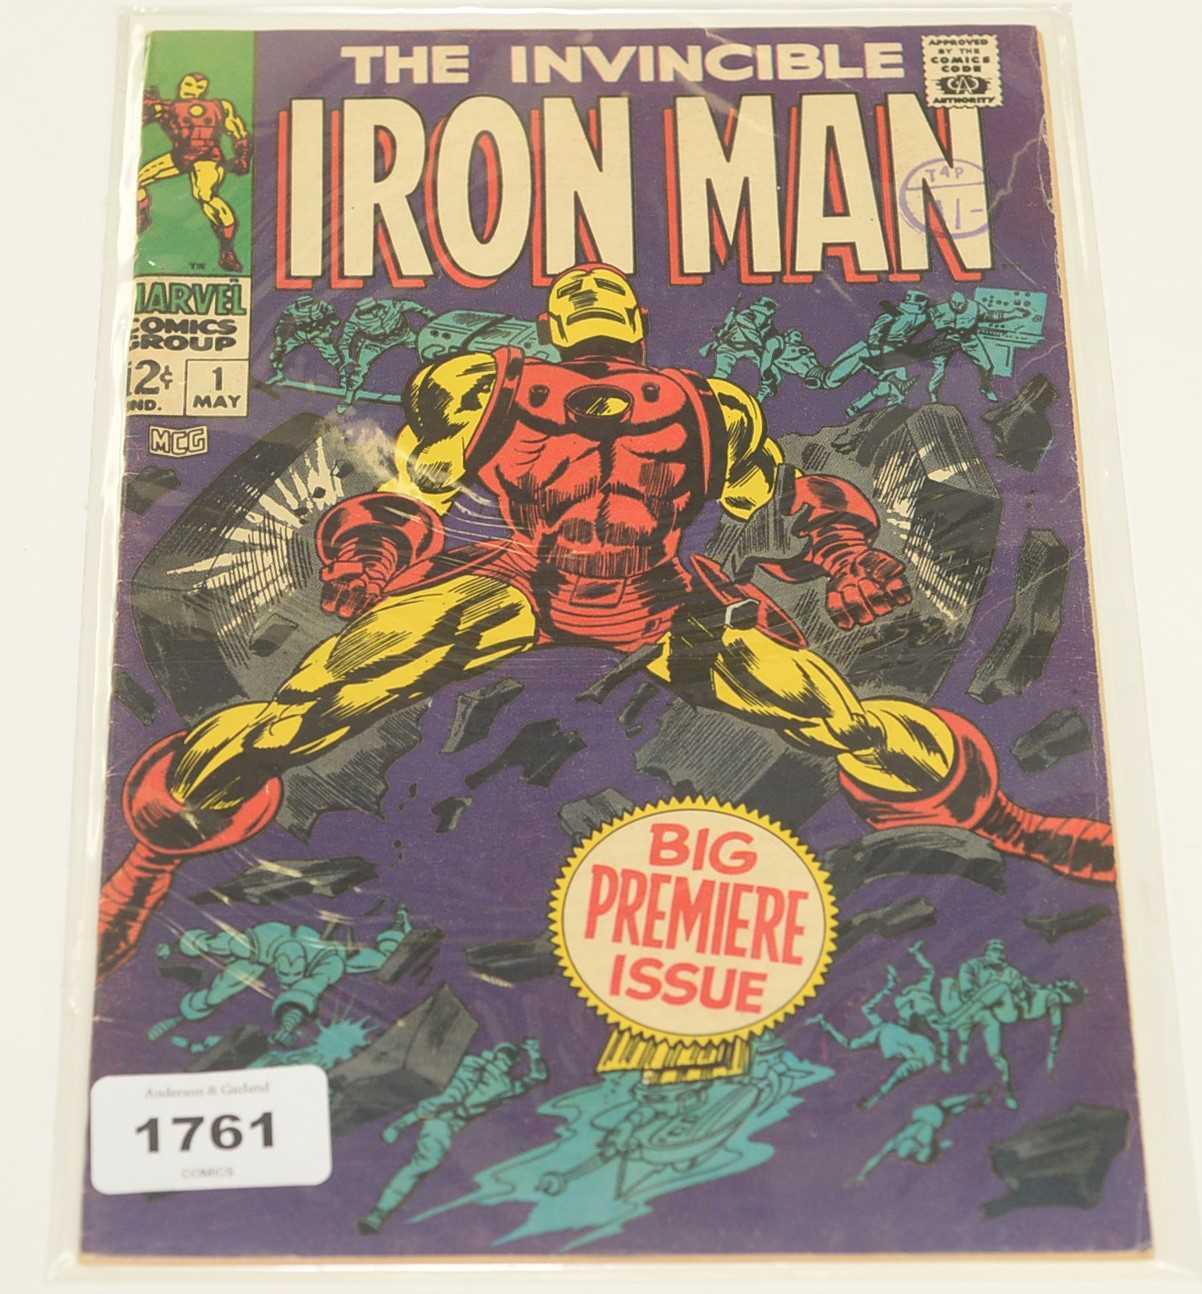 Lot 1761 - The Invincible Iron Man No.1 Comic